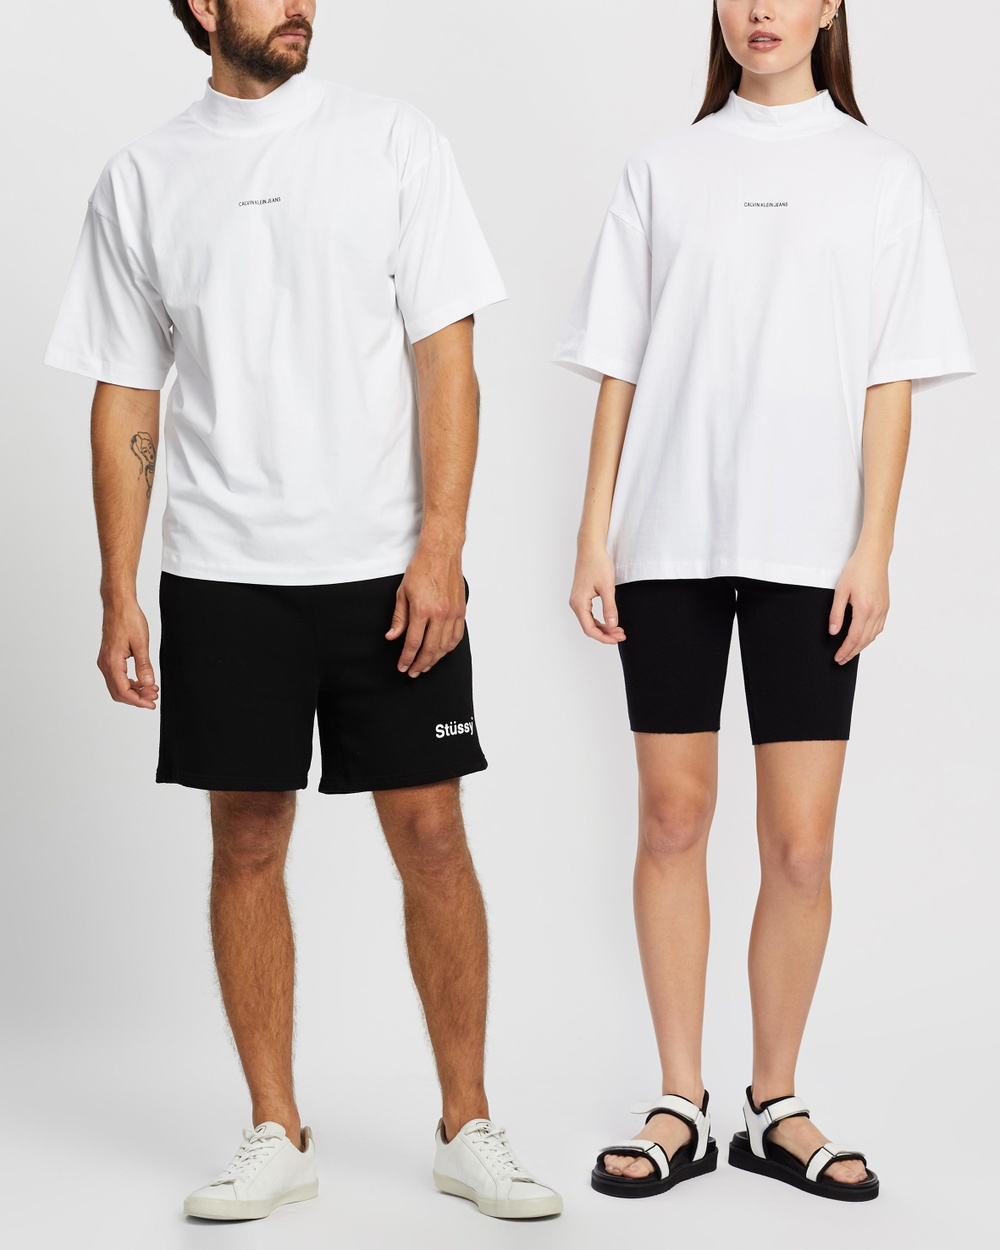 Calvin Klein Jeans - Micro Branding Mock Neck   Unisex - T-Shirts & Singlets (Bright White) Micro Branding Mock Neck - Unisex